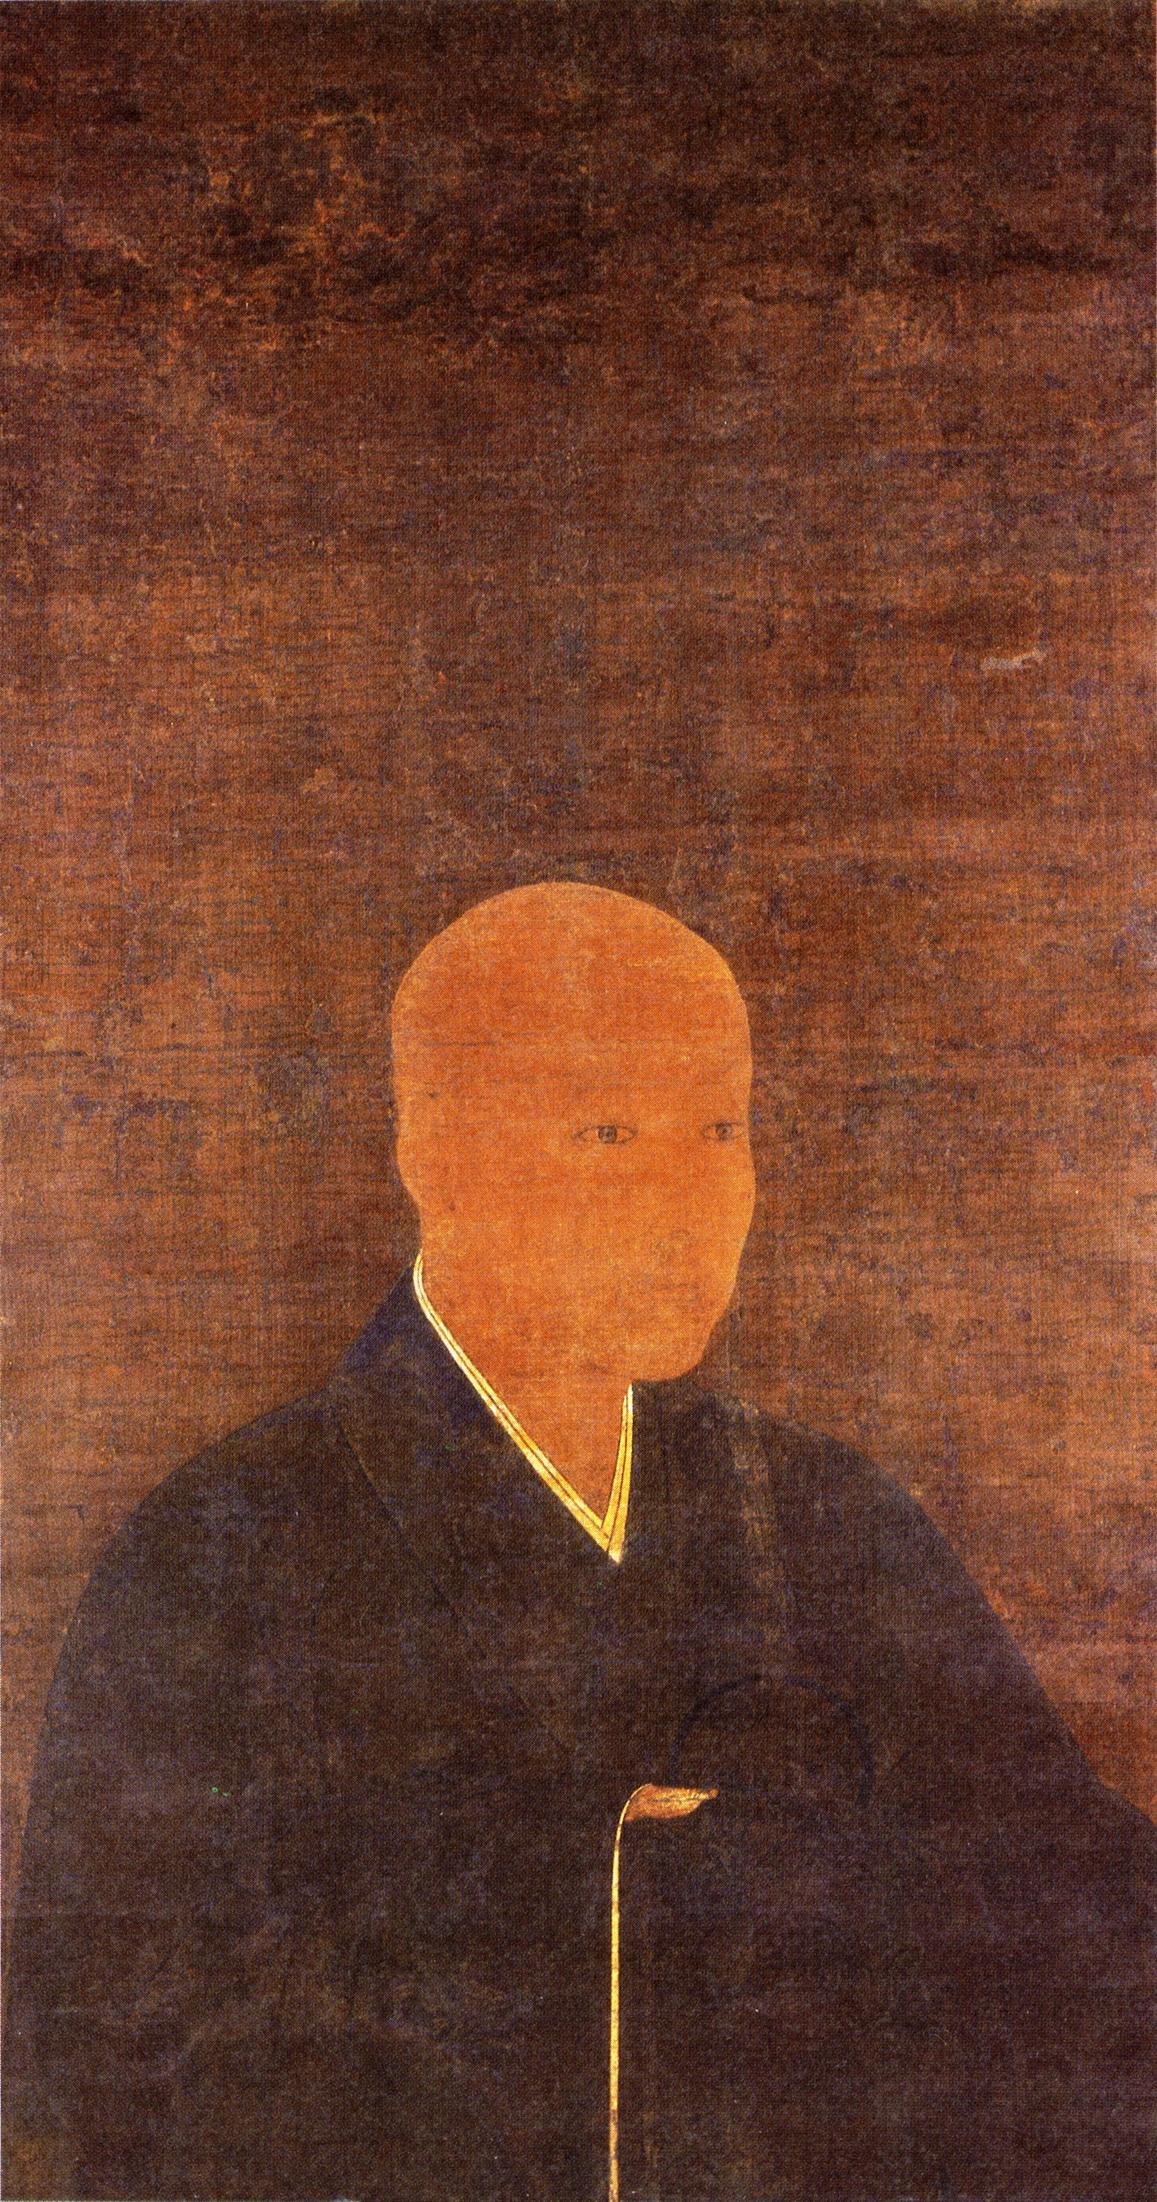 光厳天皇 - Wikipedia